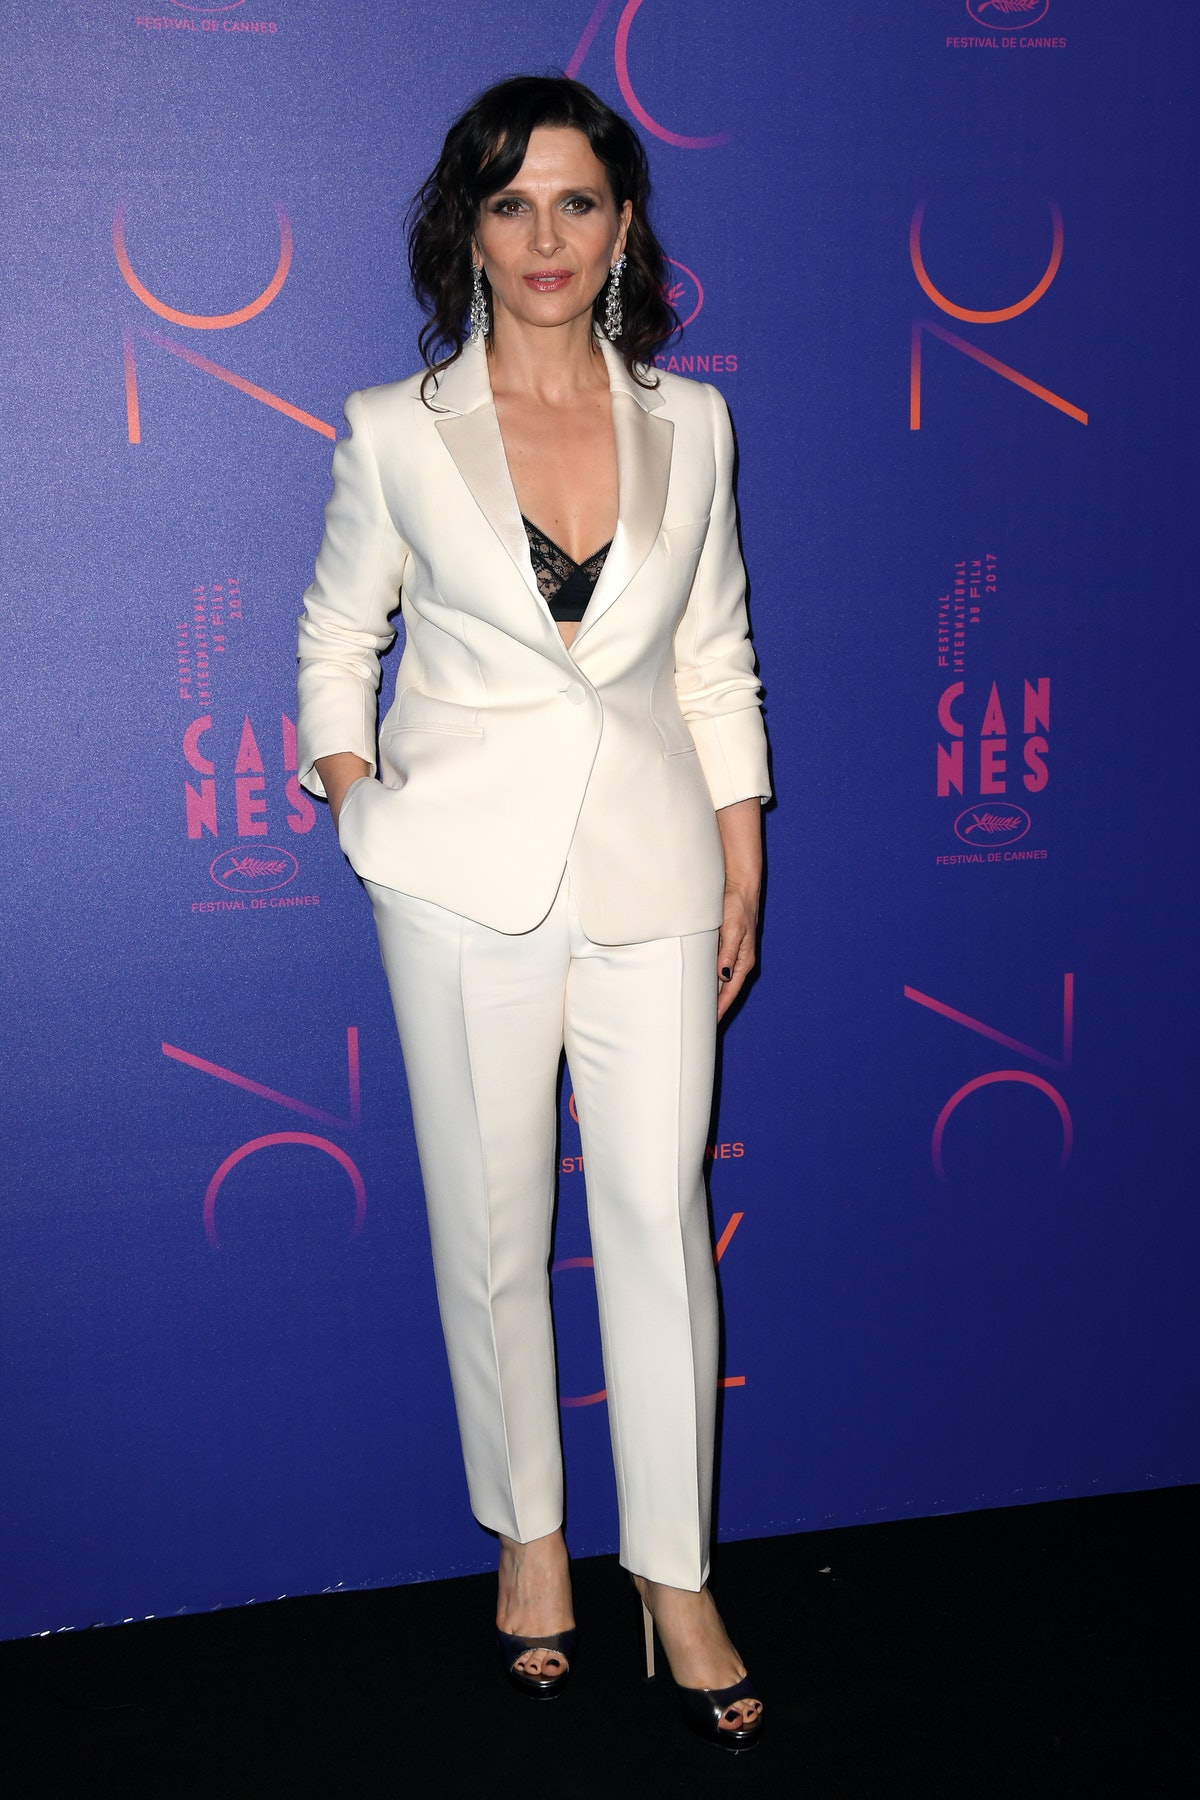 70th Anniversary Dinner - The 70th Annual Cannes Film Festival